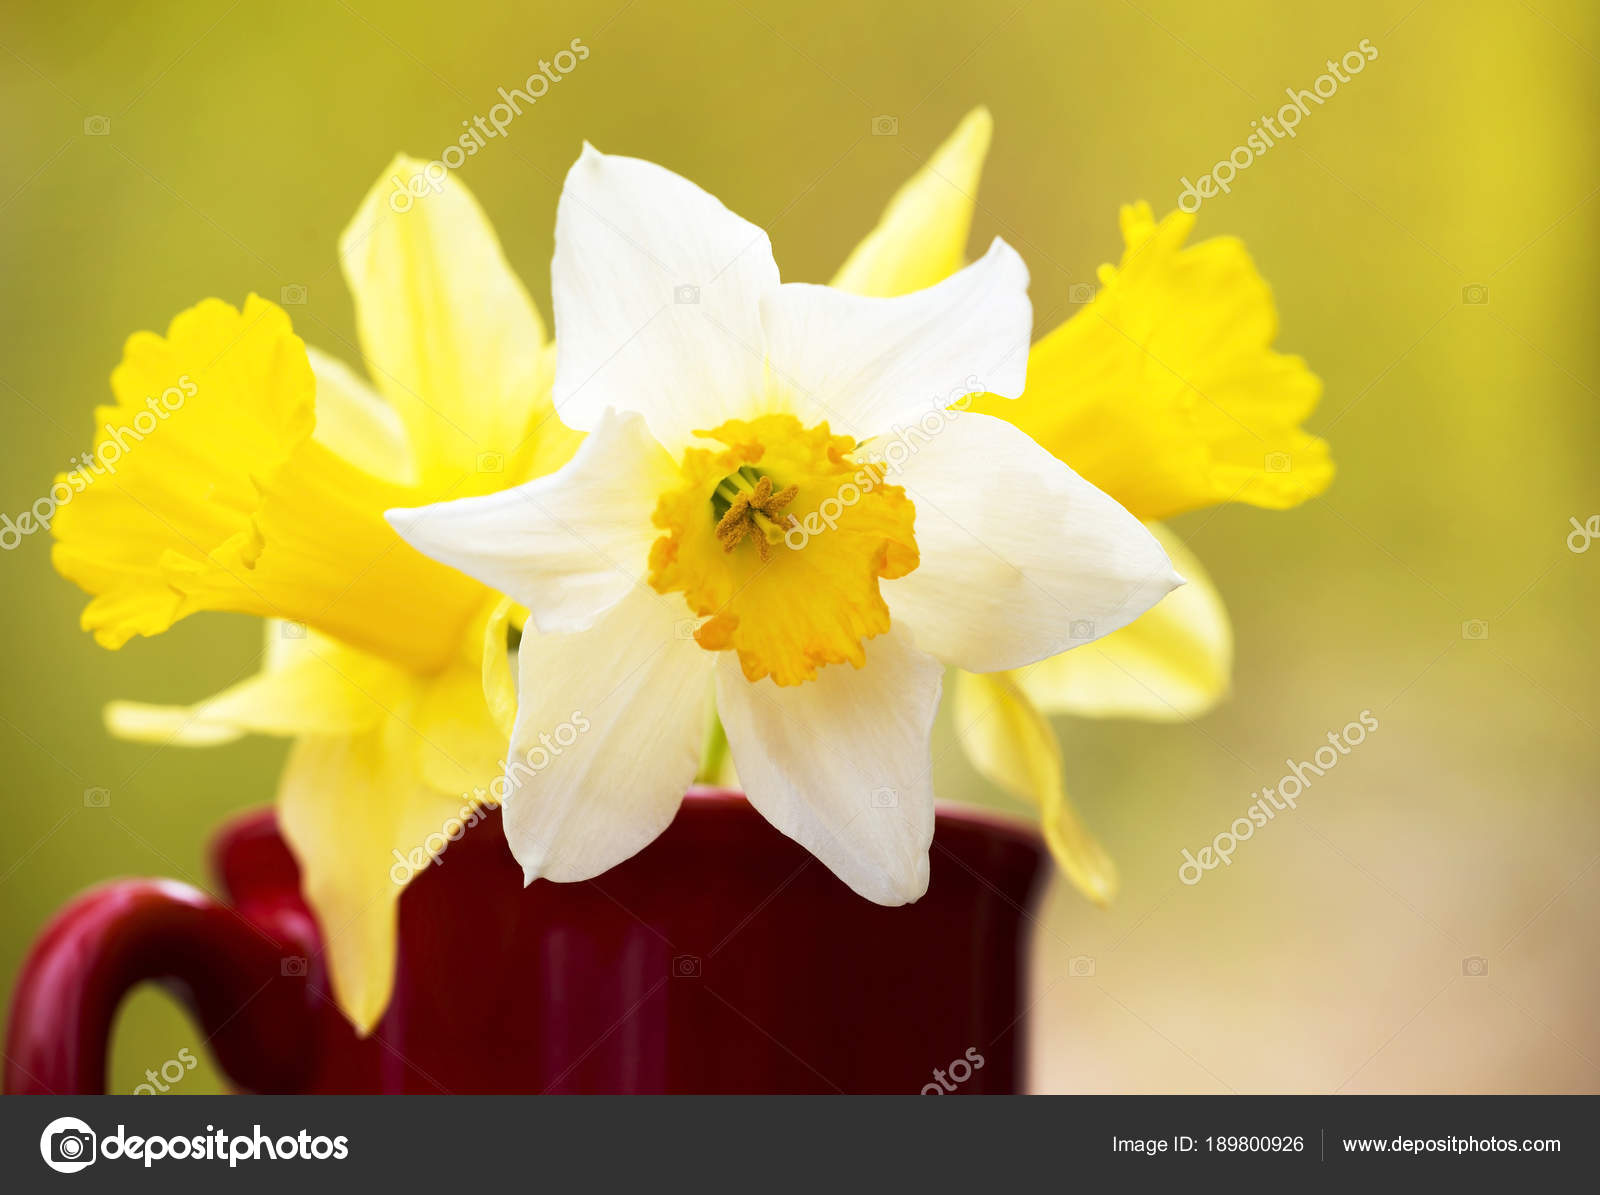 White And Yellow Easter Flowers Stock Photo Marenka1 189800926